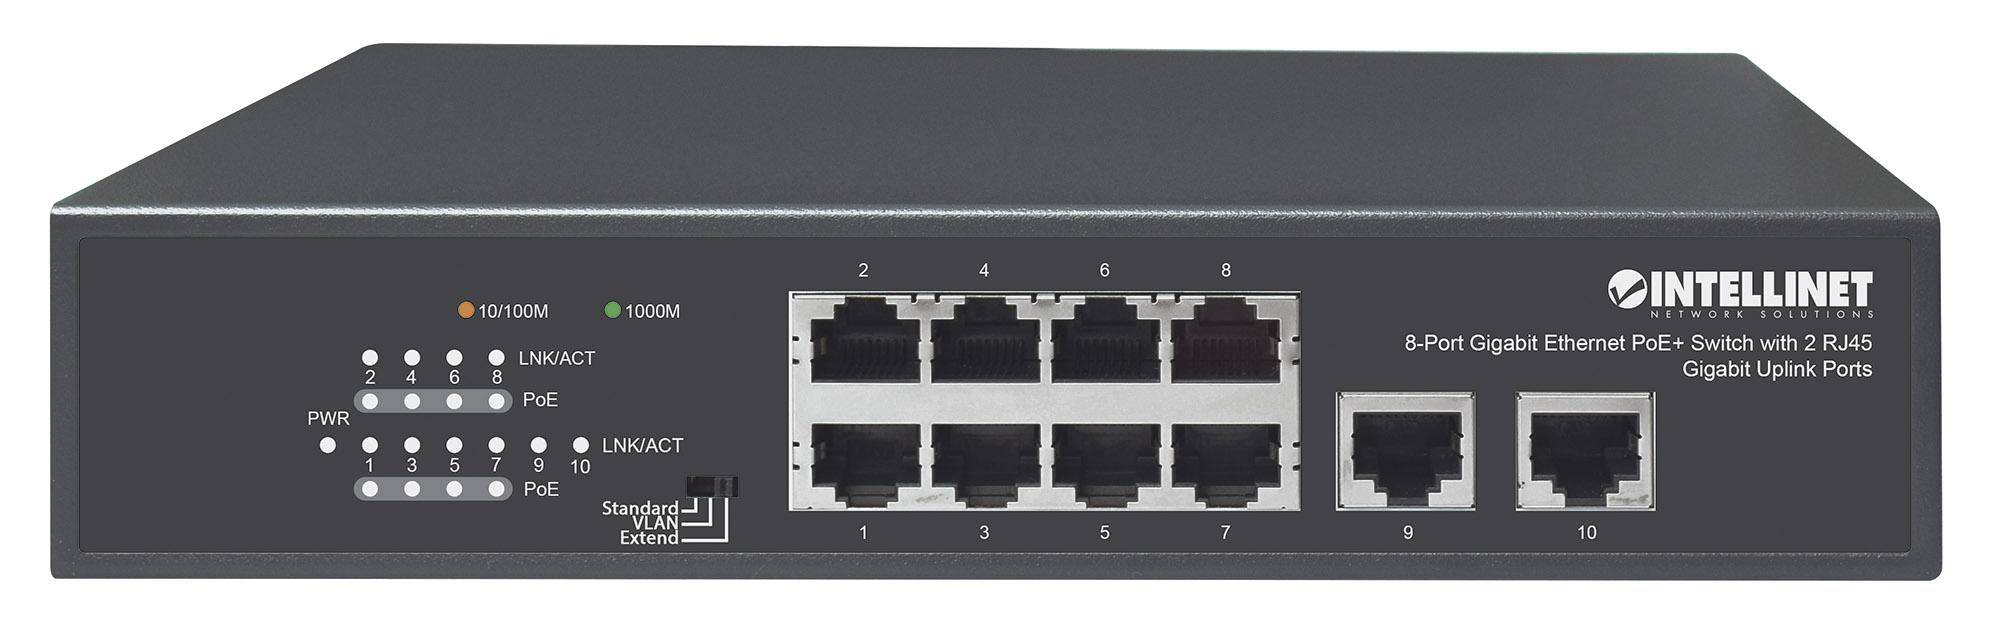 intellinet switch ethernet gigabit 8 porte poe+ con 2 porte rj45 gigabit...